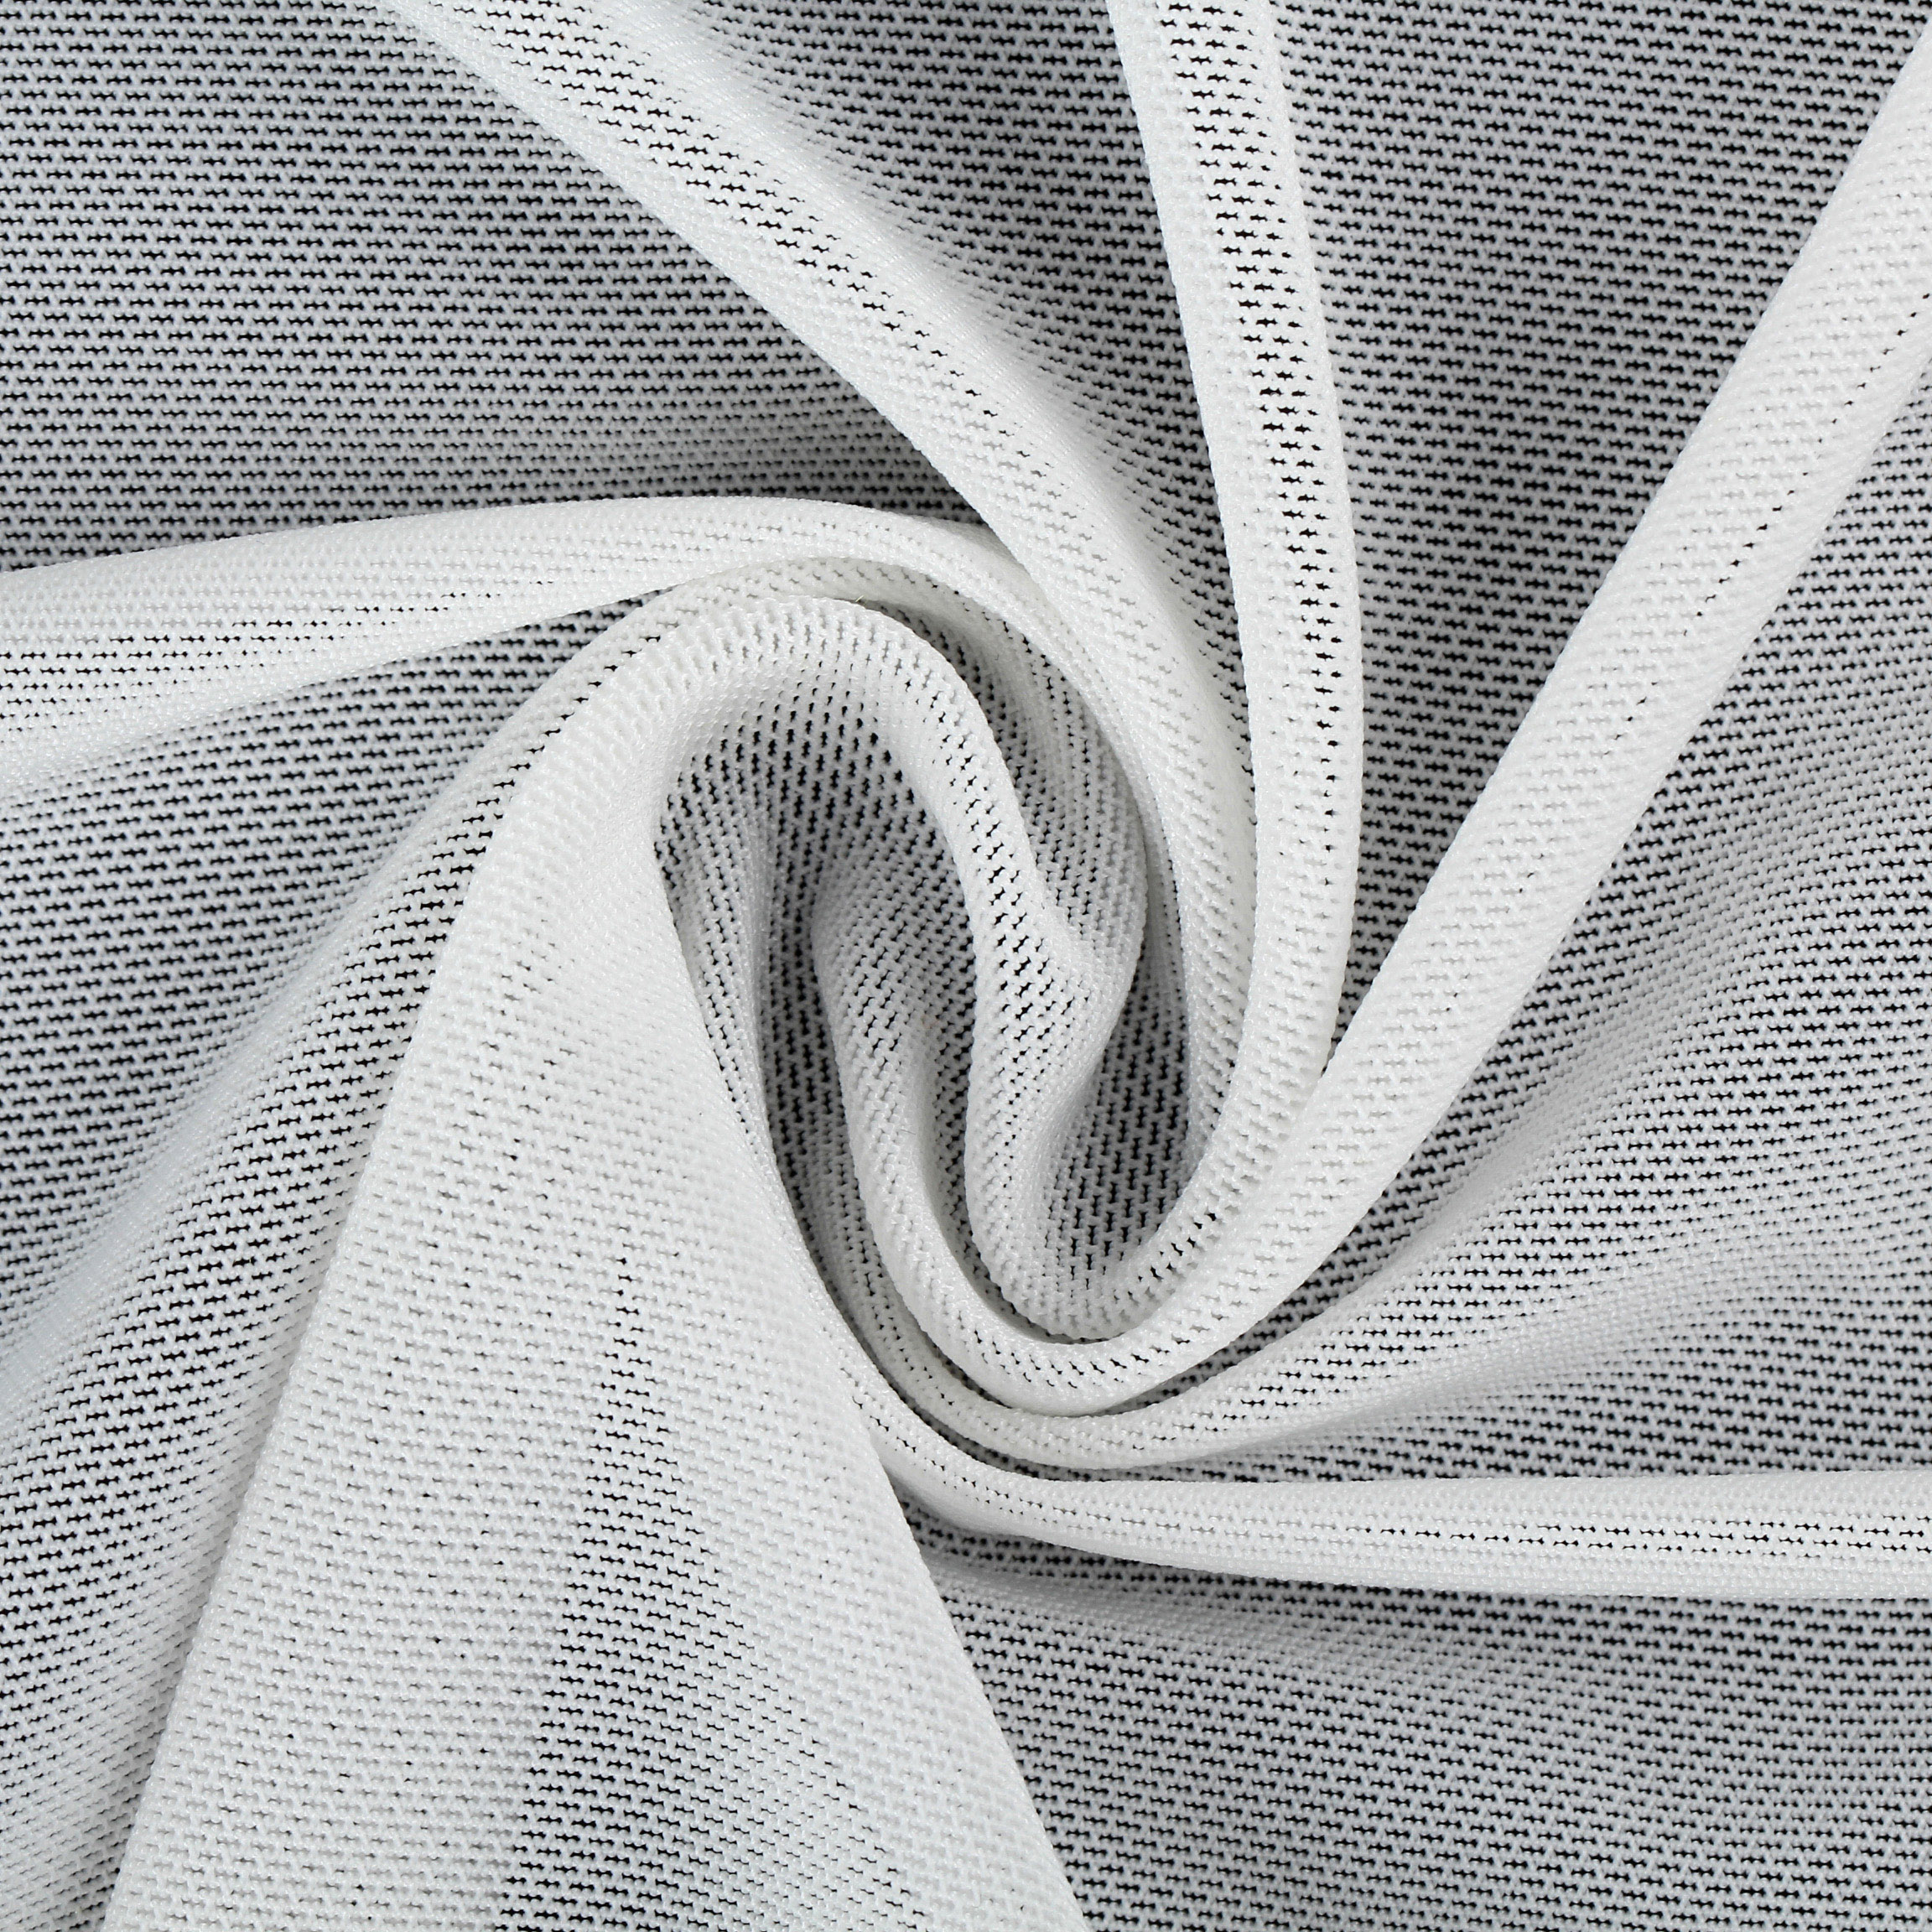 warp knitted plain dyed 4 way stretch mesh 85% nylon 15% spandex fabric for underwear